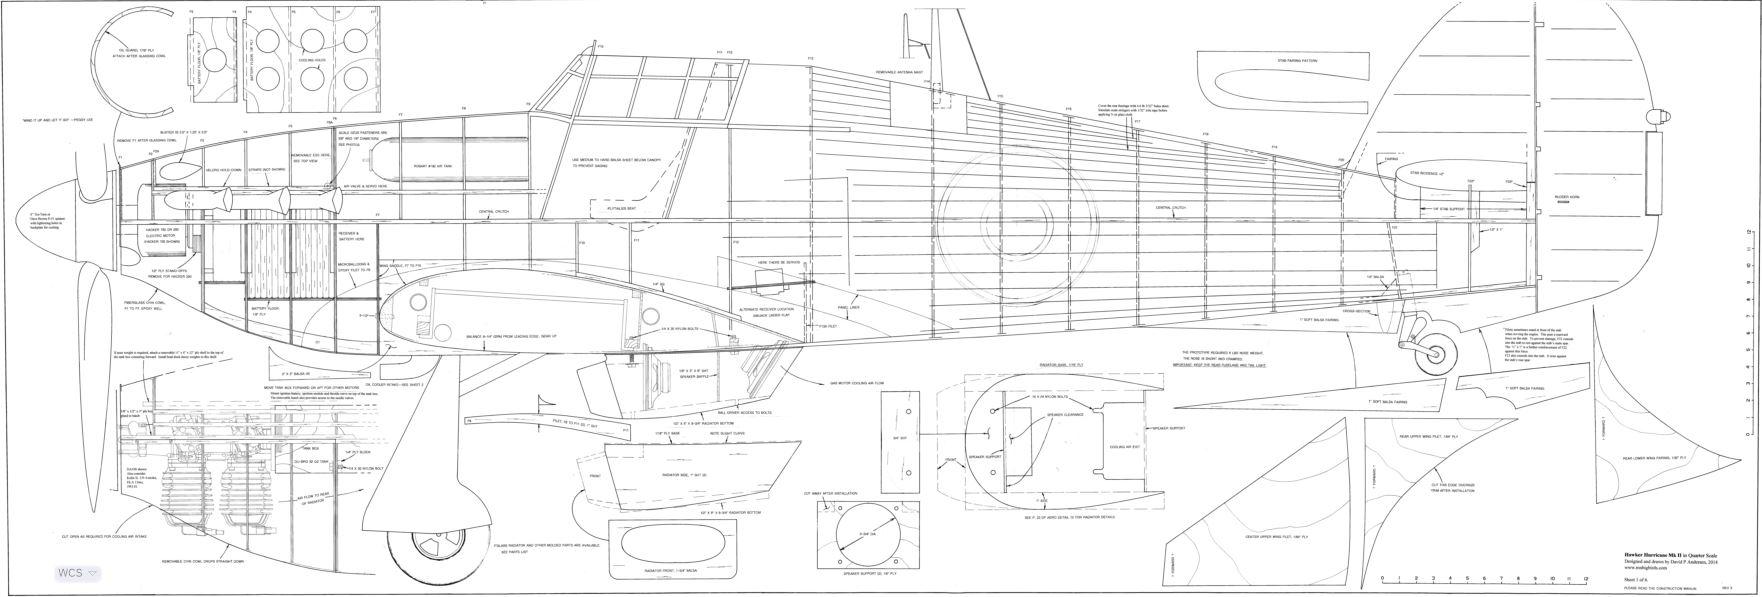 1/4 scale Hawker Hurricane-Gas - $460 00 : Laser Design Services